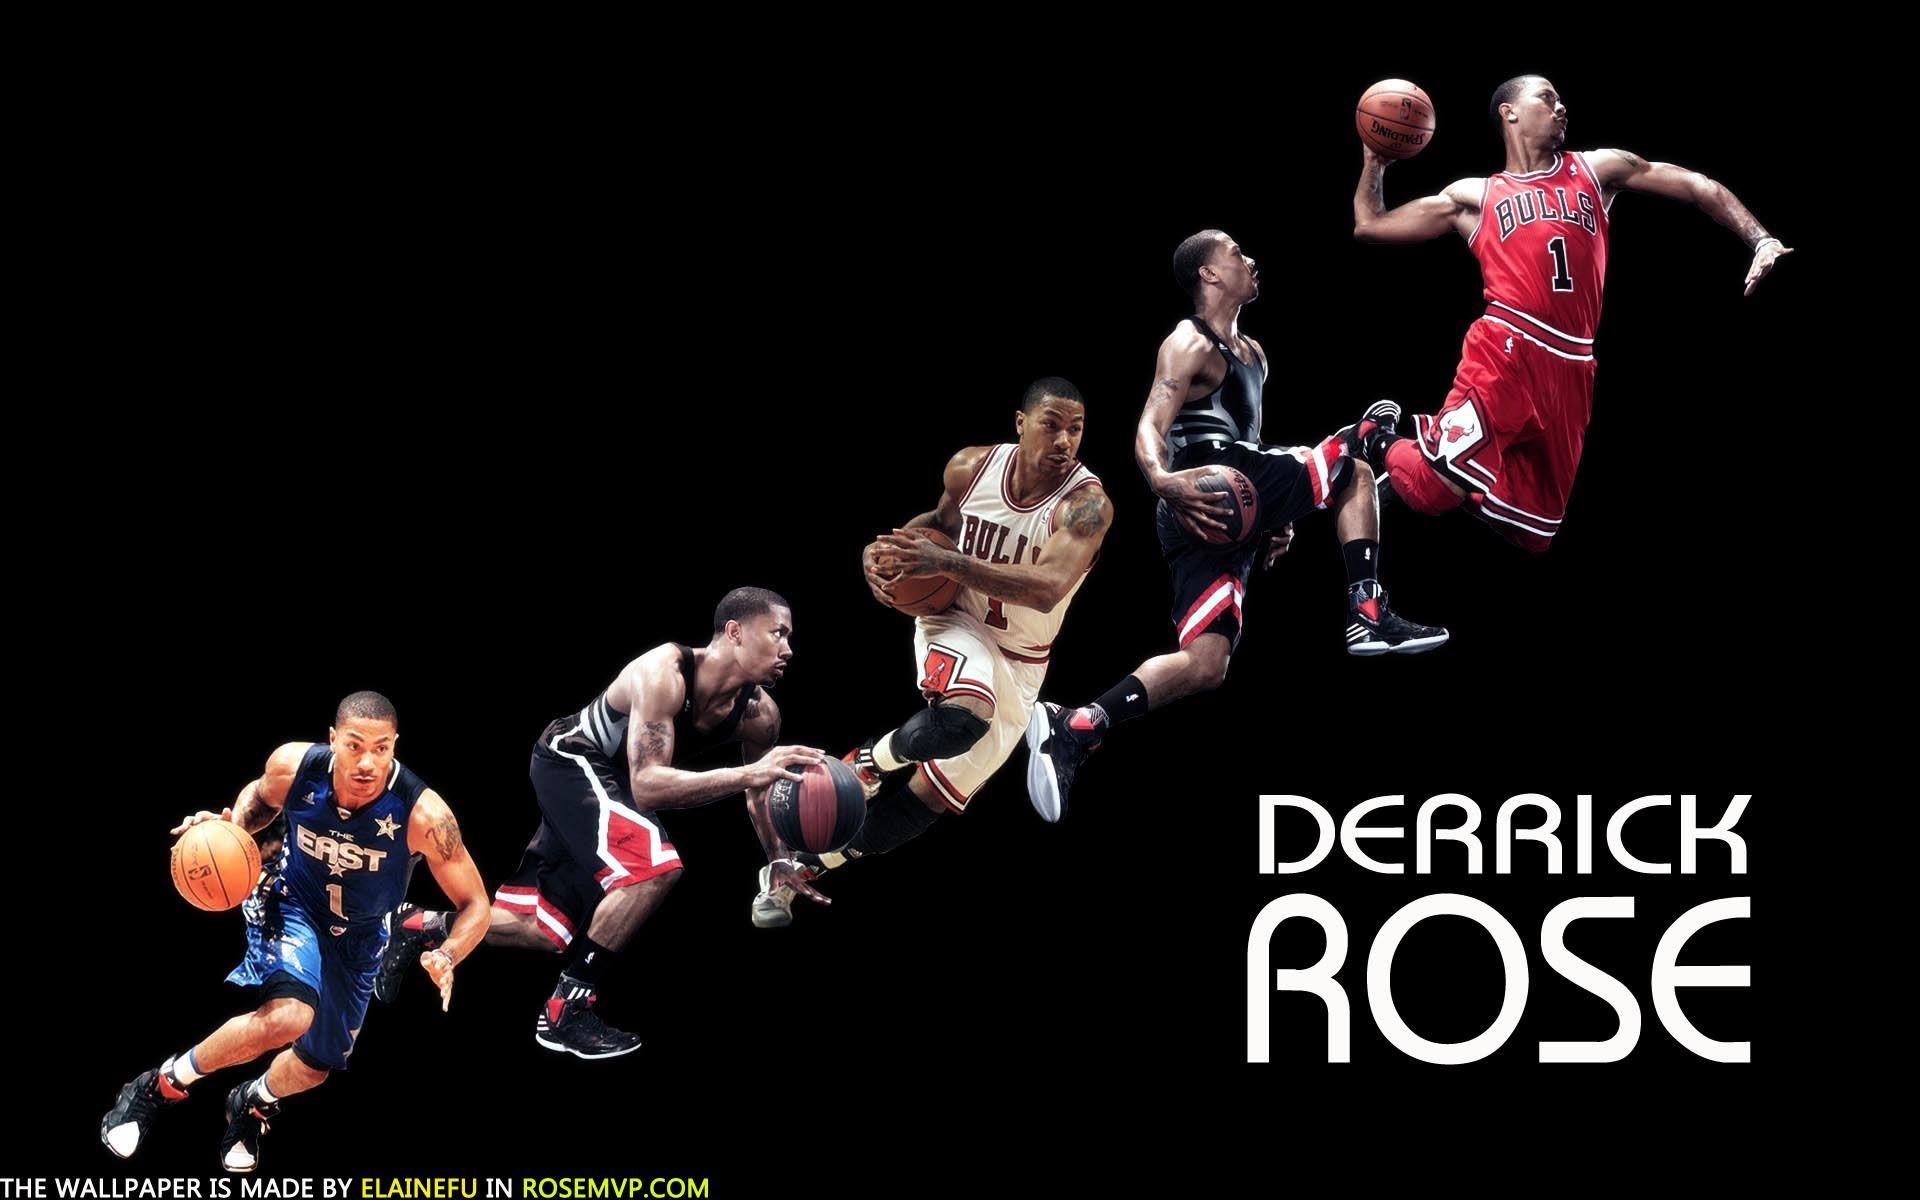 d rose logo